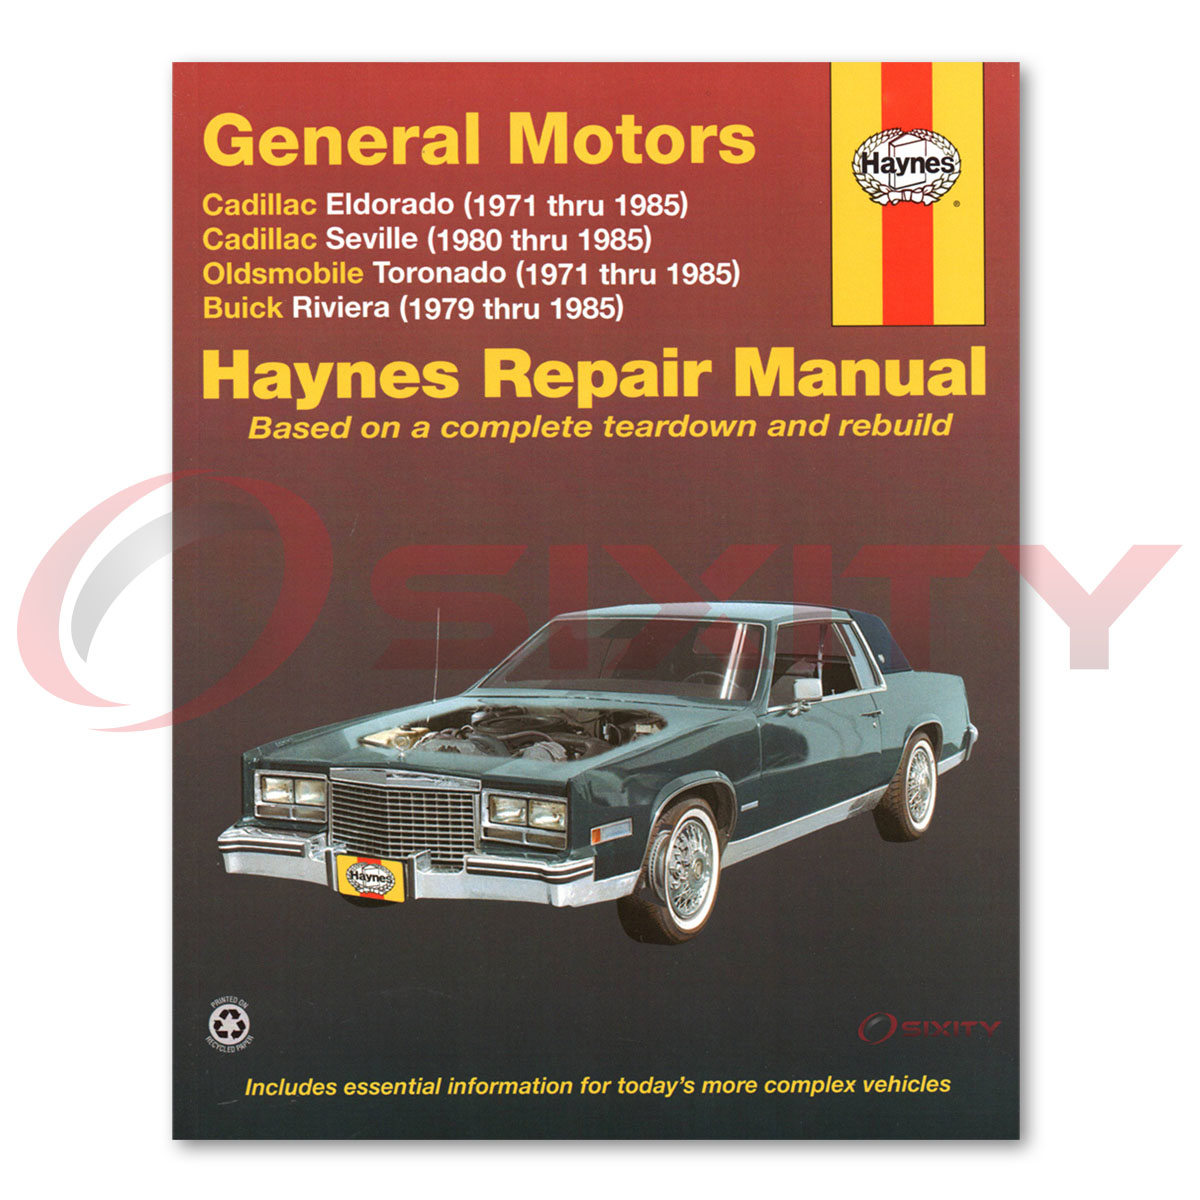 1985 pontiac fiero wiring diagram images opel zafira wiring diagram on haynes repair manuals wiring